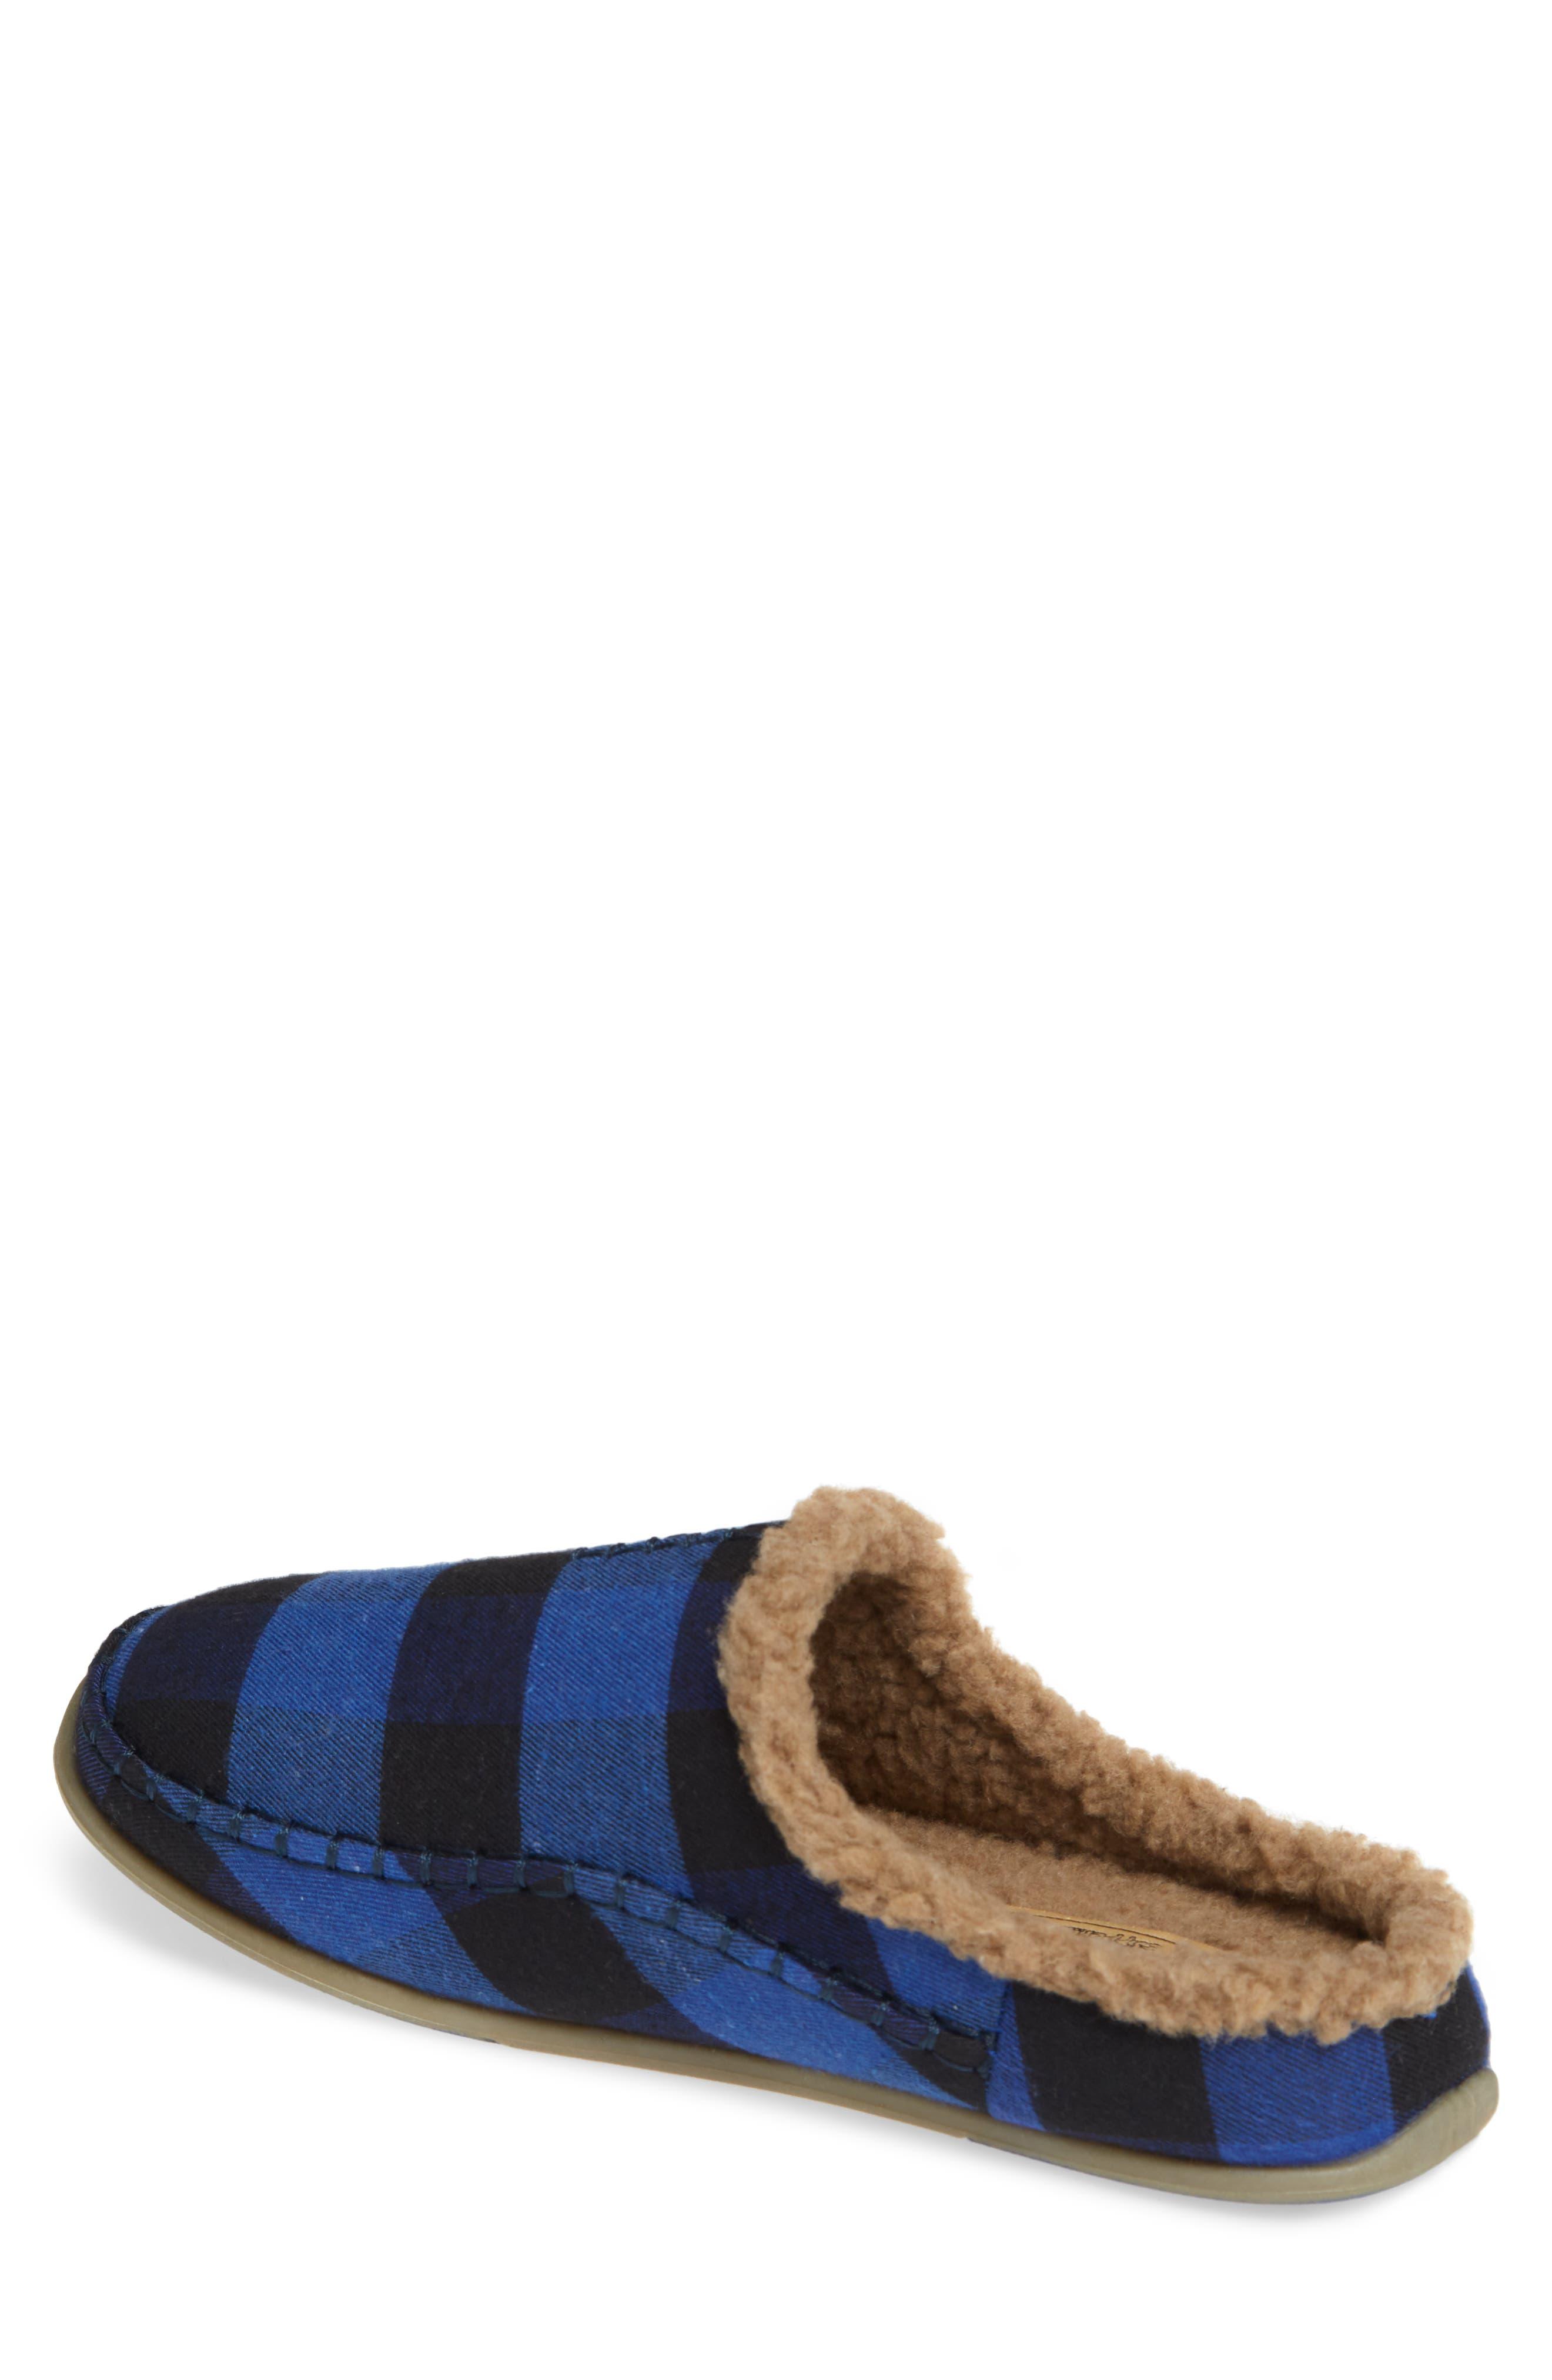 Nordic Slipper,                             Alternate thumbnail 2, color,                             BLUE / BLACK